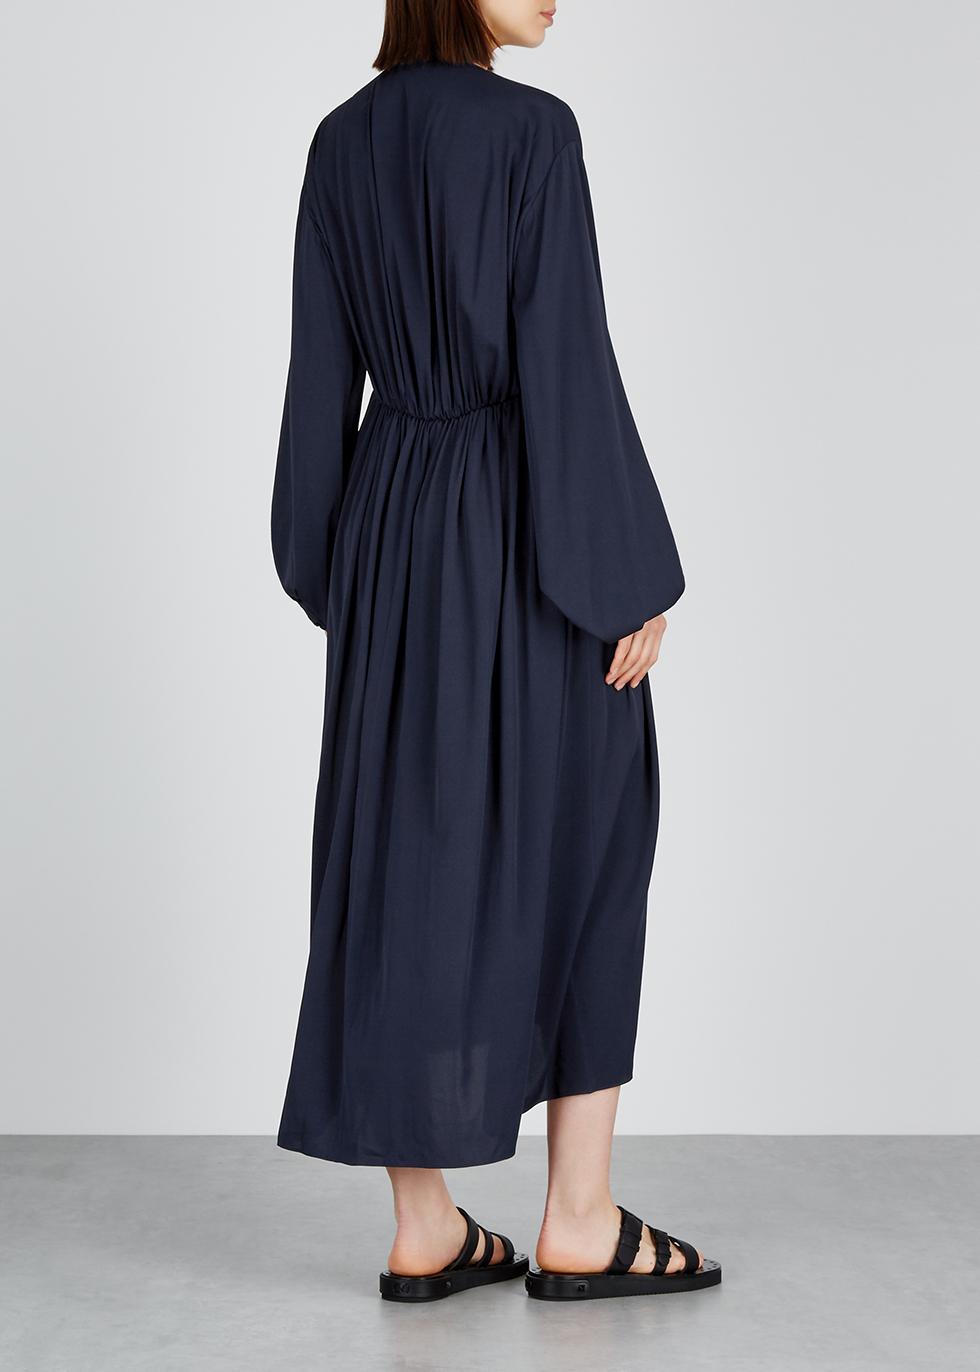 Sasha navy stretch-silk midi dress - THE ROW